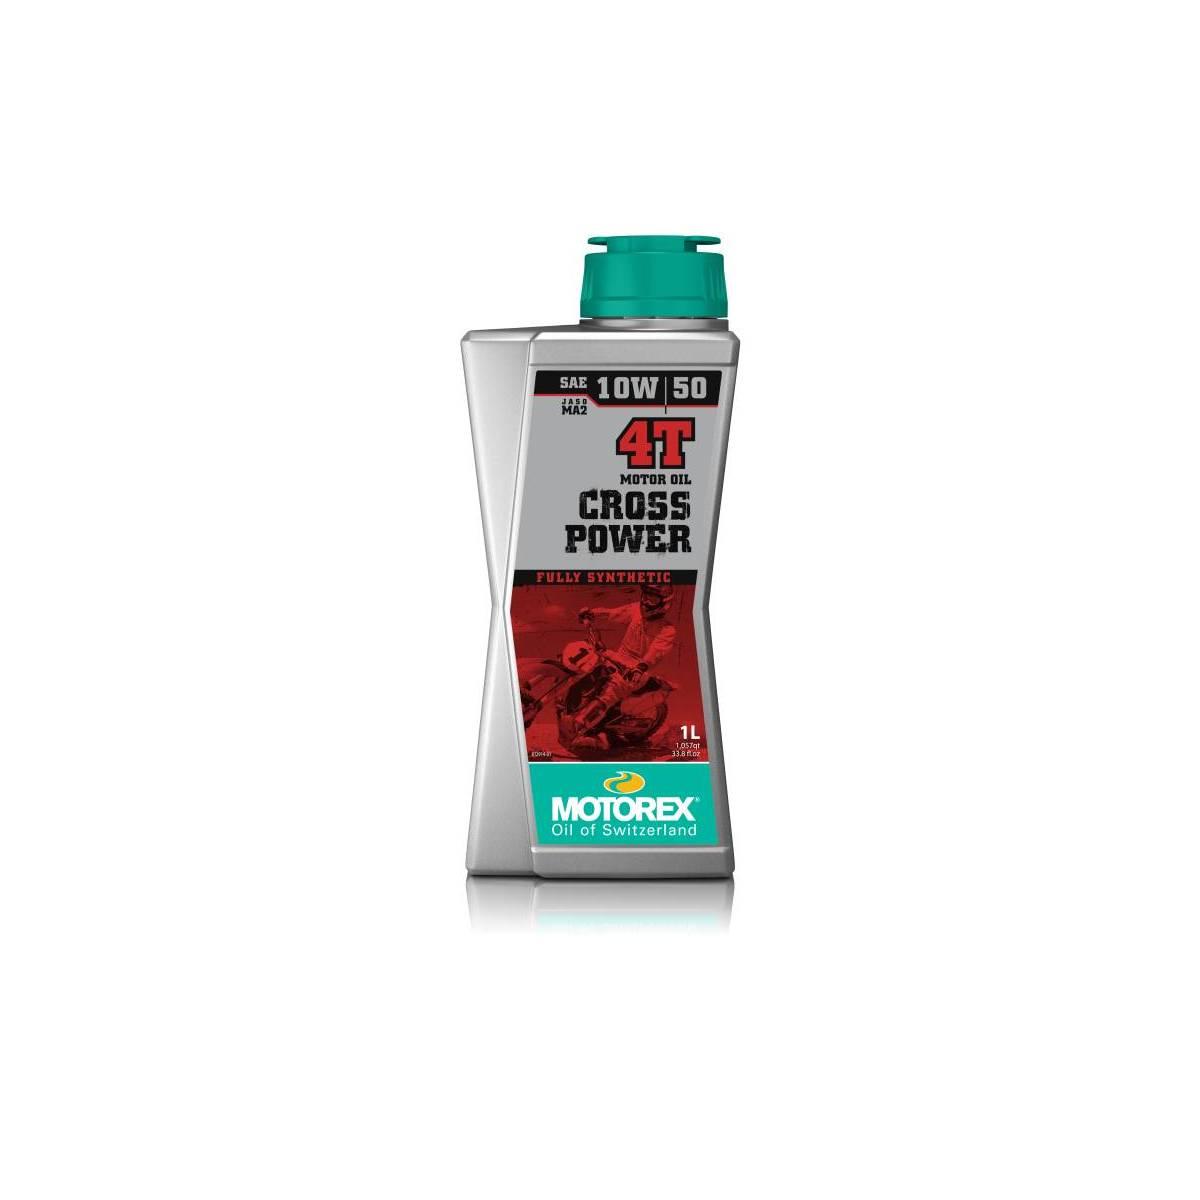 MT064H004T - Motorex Cros Power 4T 10W50 1 Litro